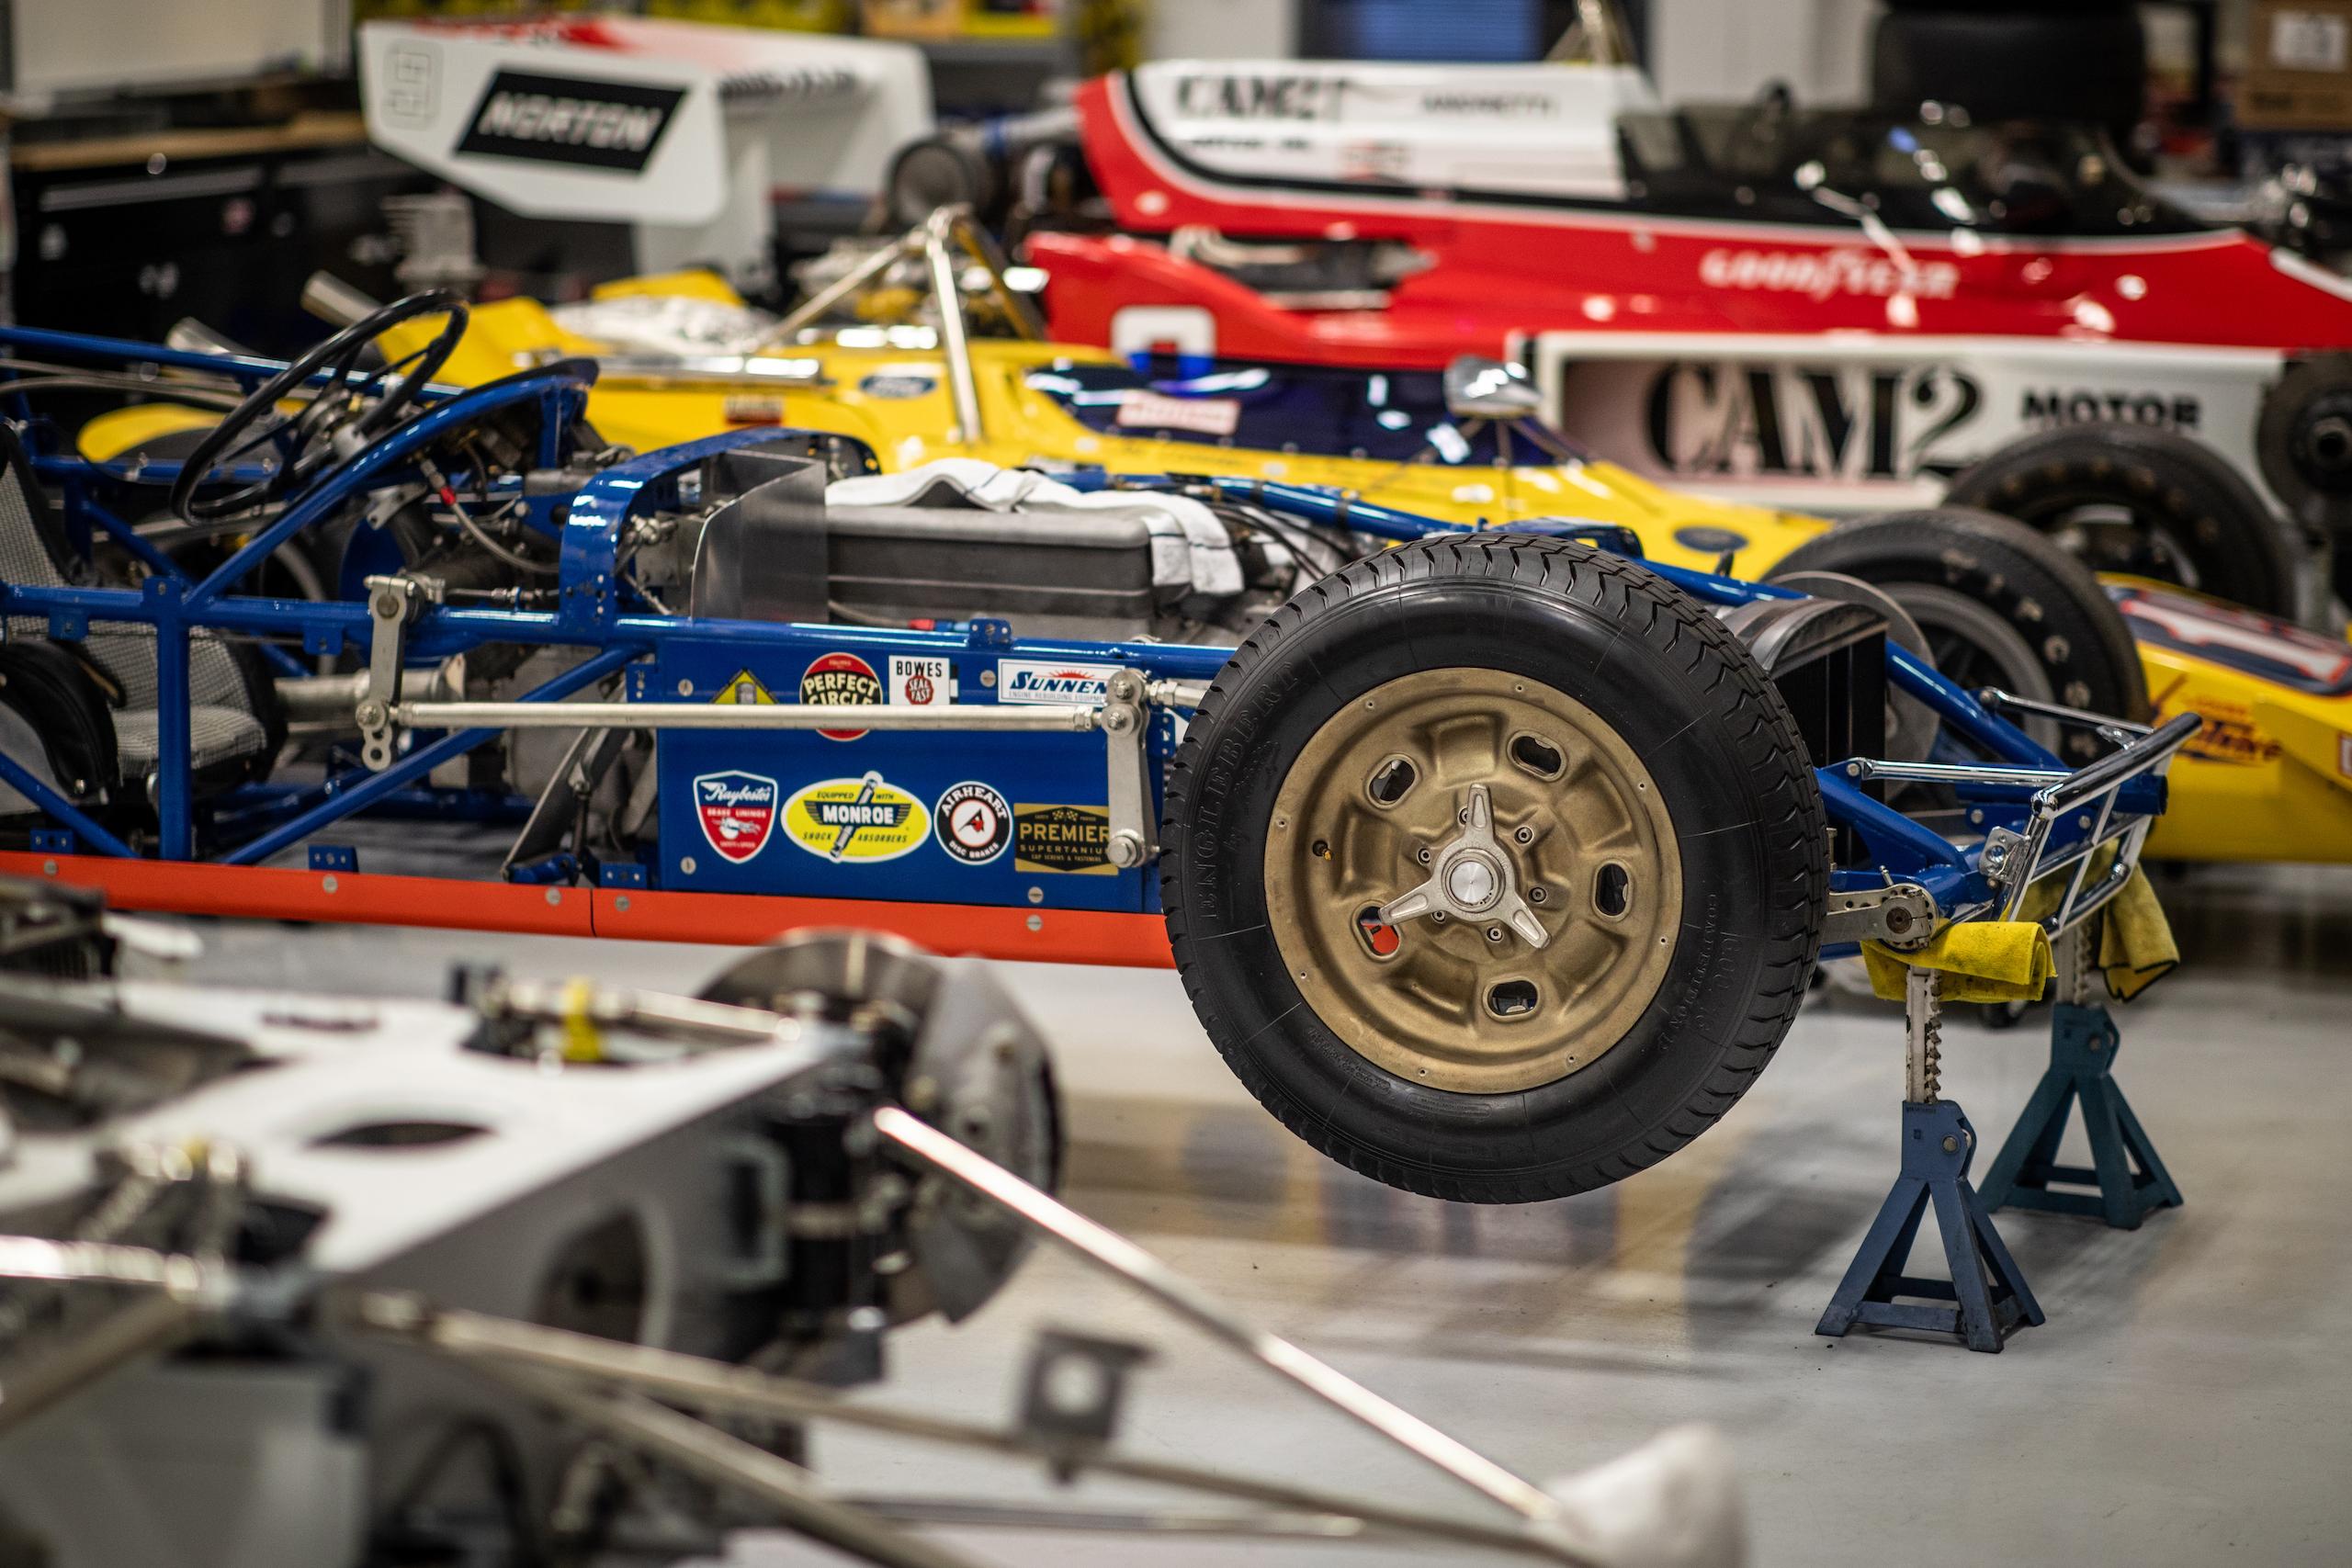 Turn 4 Restorations racers